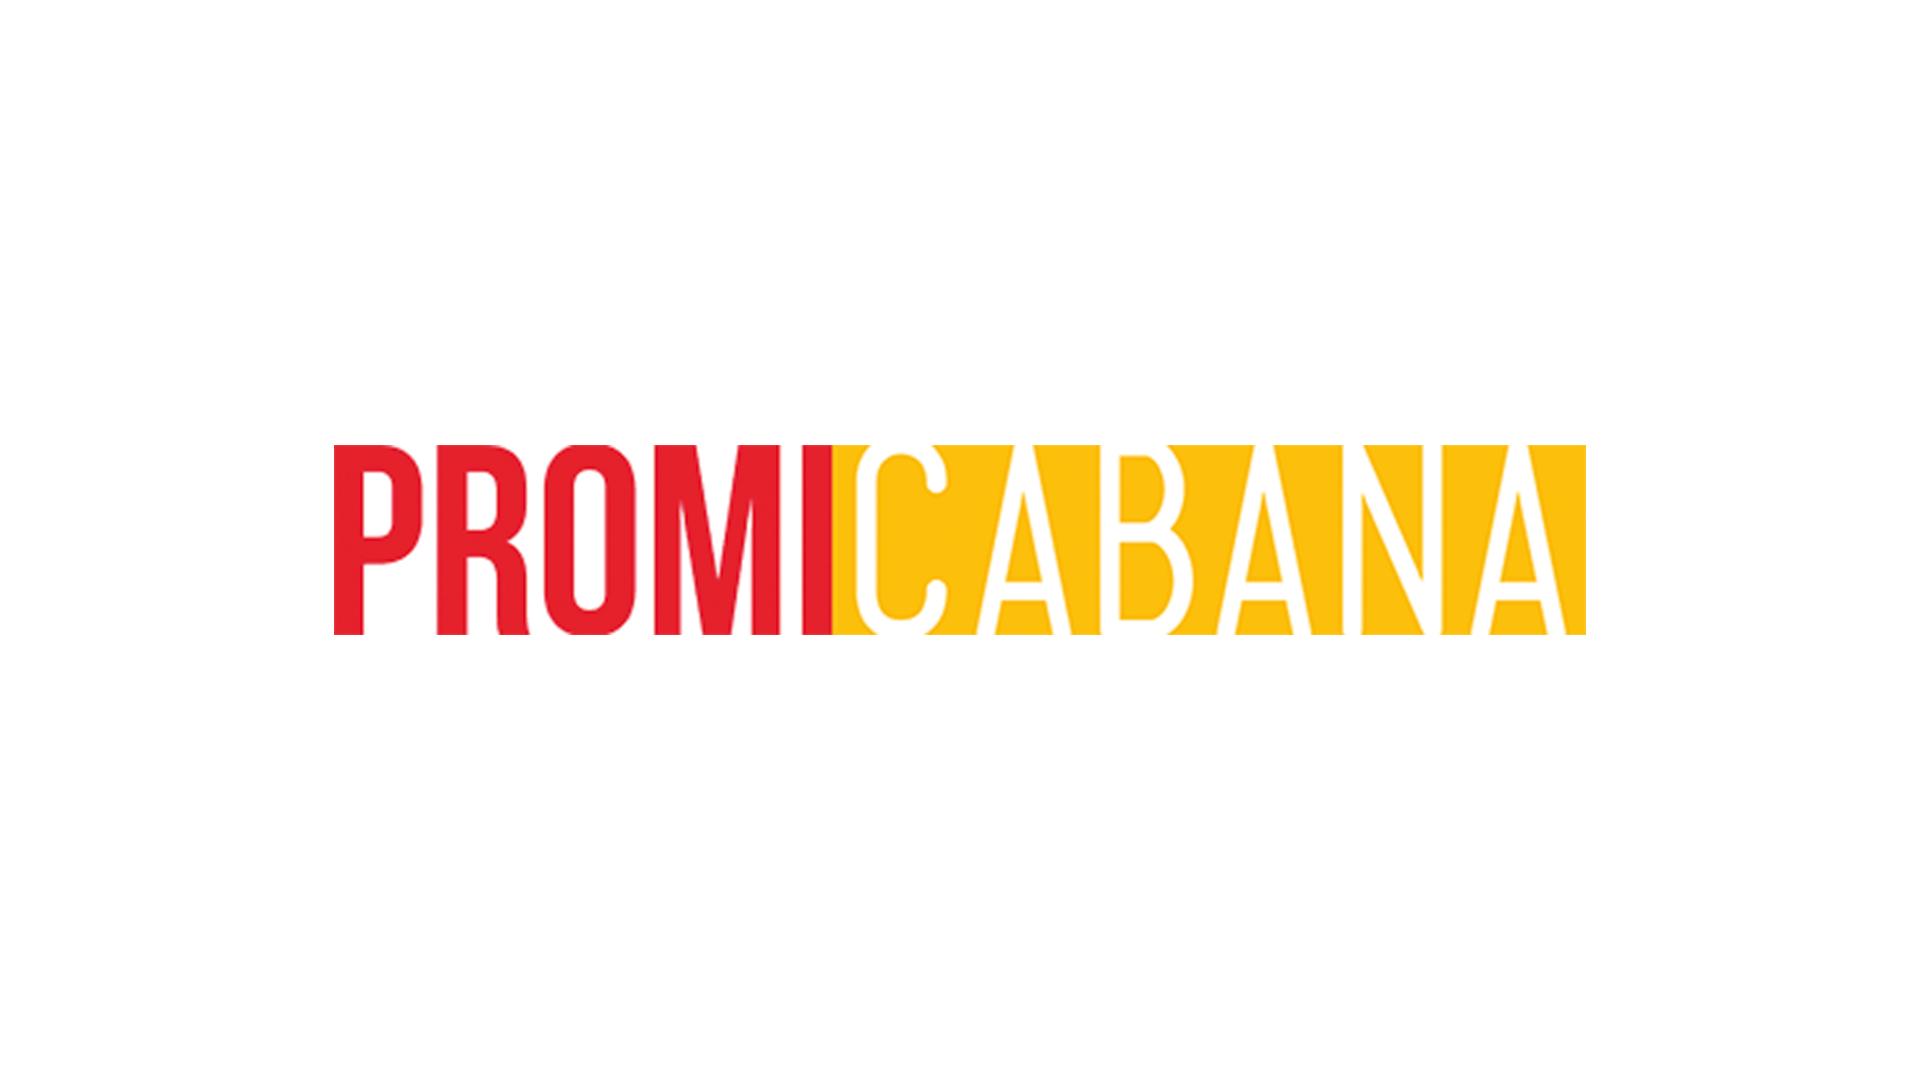 Harry-Styles-Taylor-Swift-Selena-Gomez-Justin-Bieber